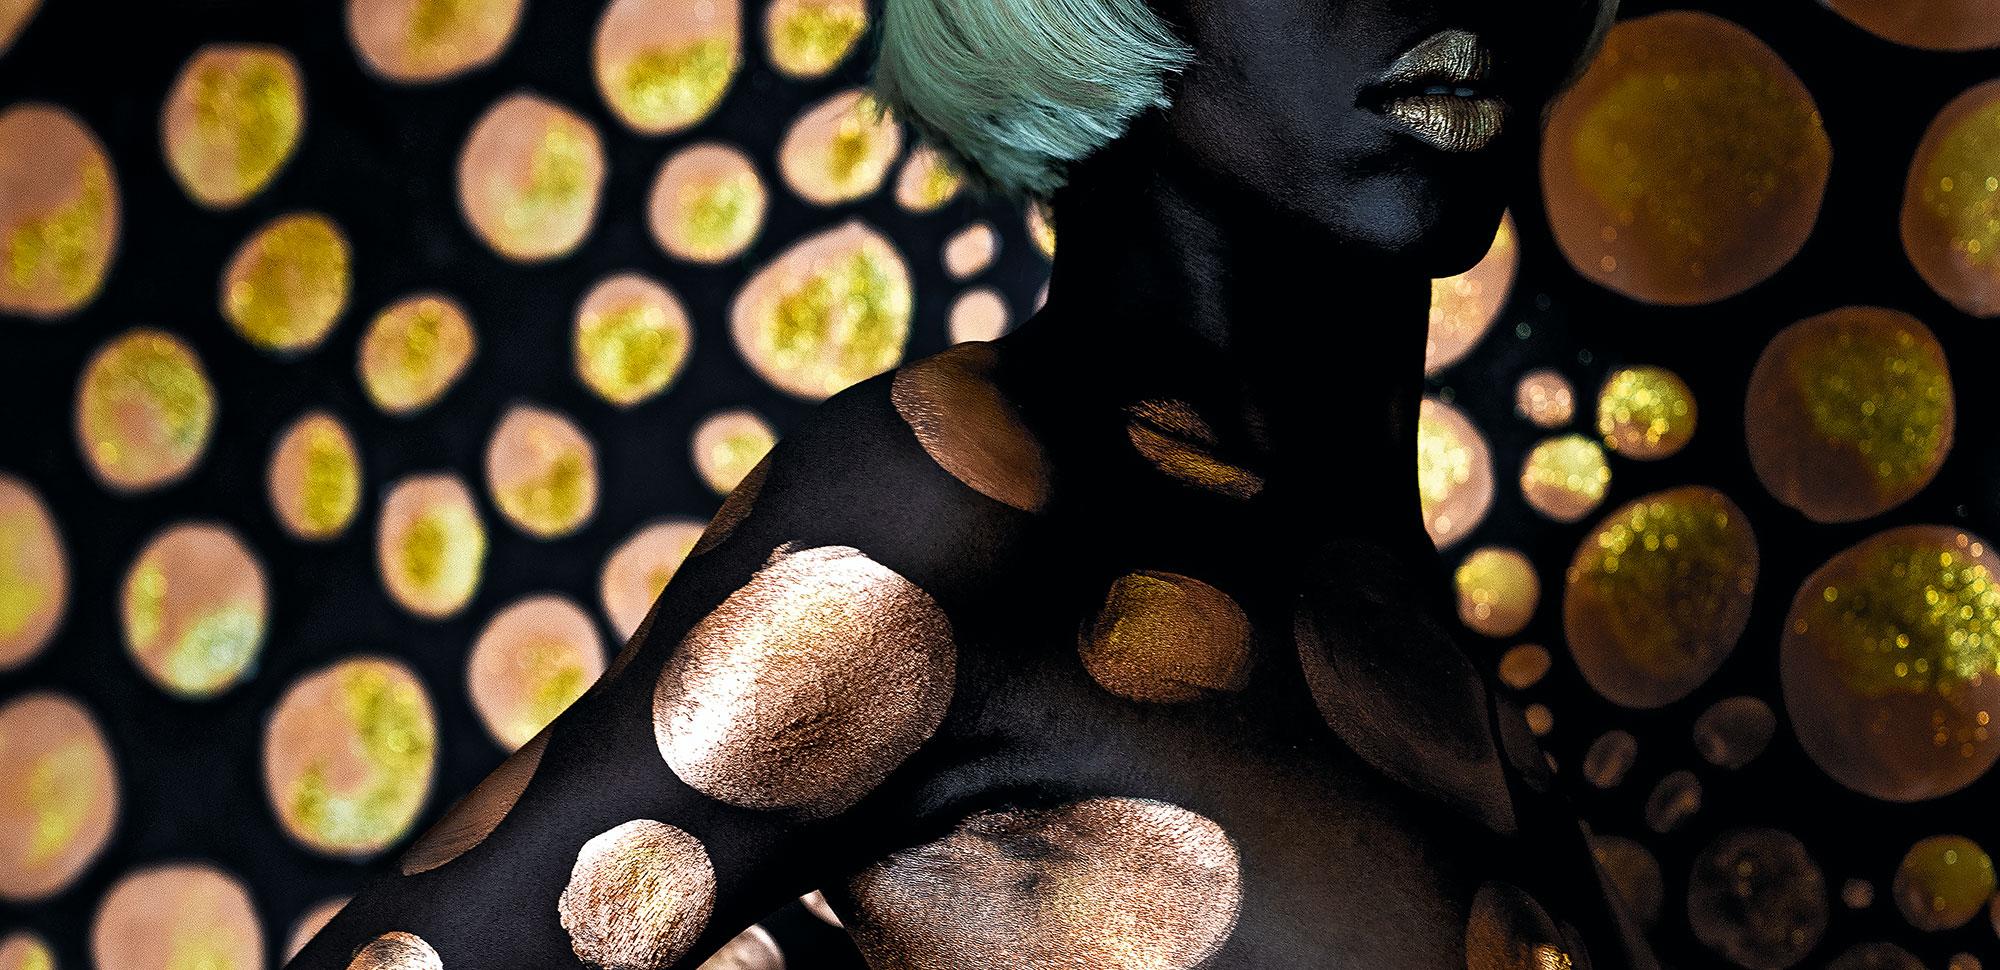 Brigitte-Nataf-02 - Eric Ceccarini - Leonhard's Gallery